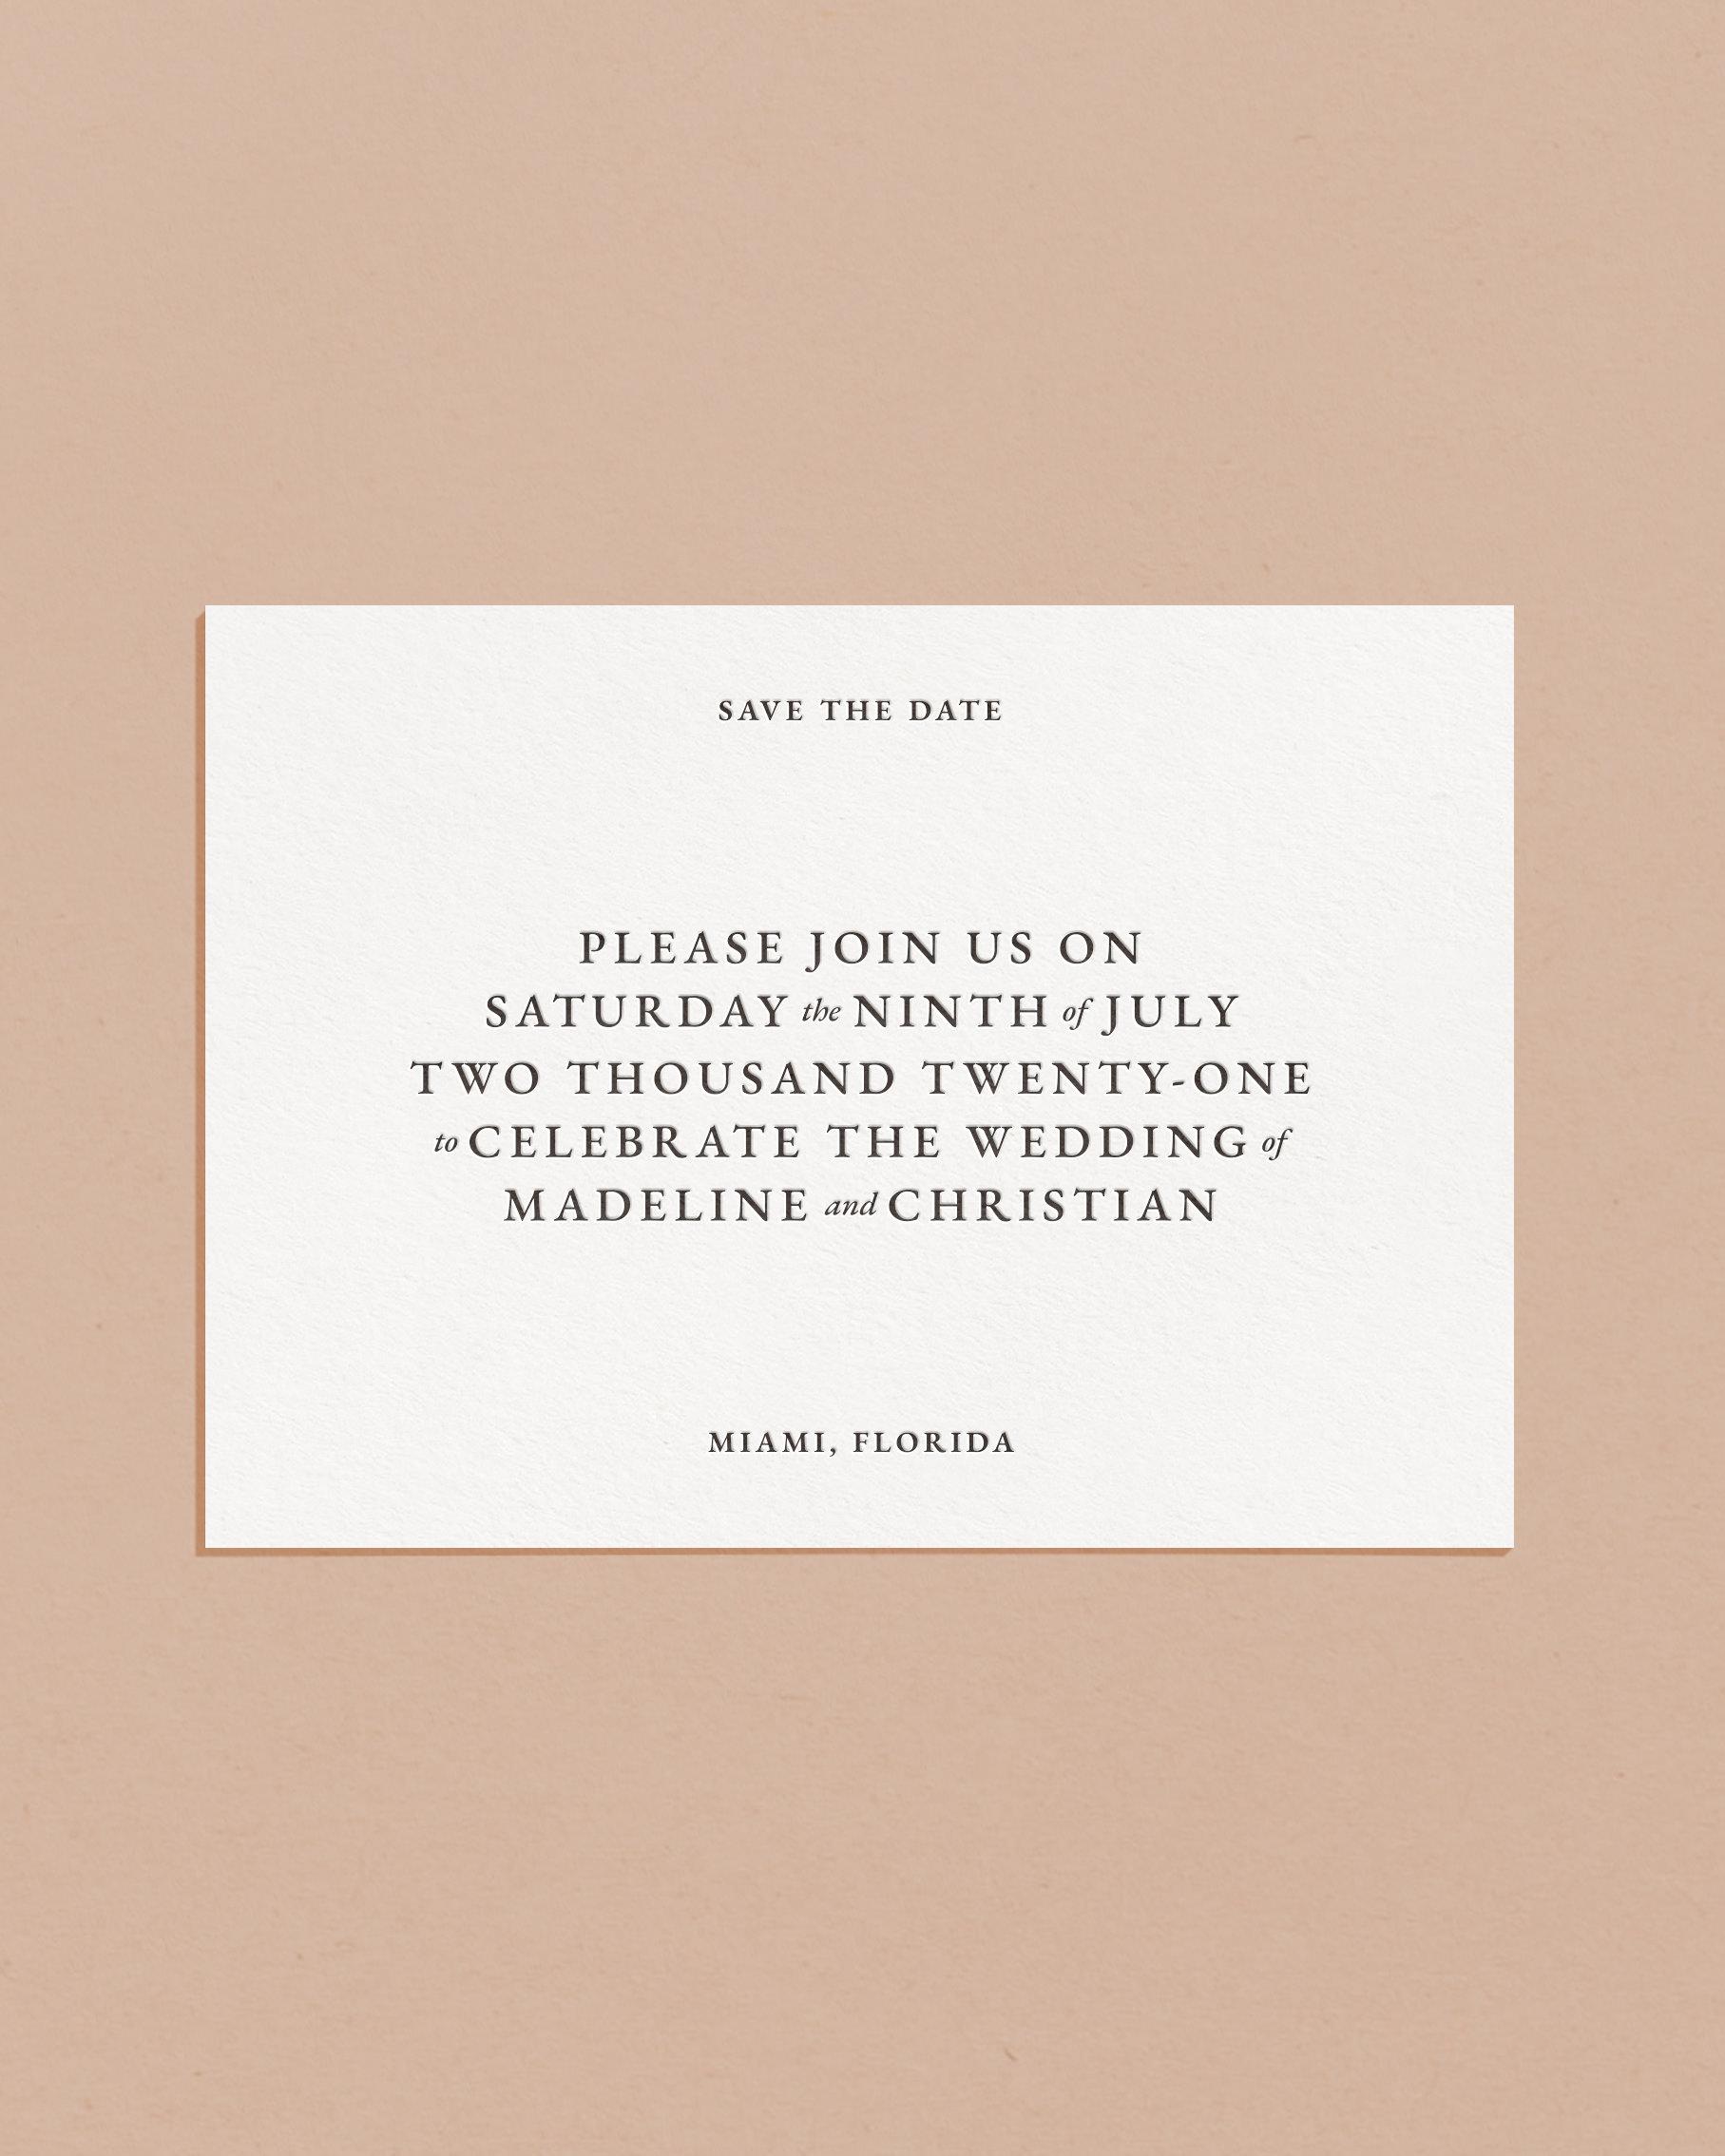 Classic Letterpress & Foil Wedding Save The Date Card